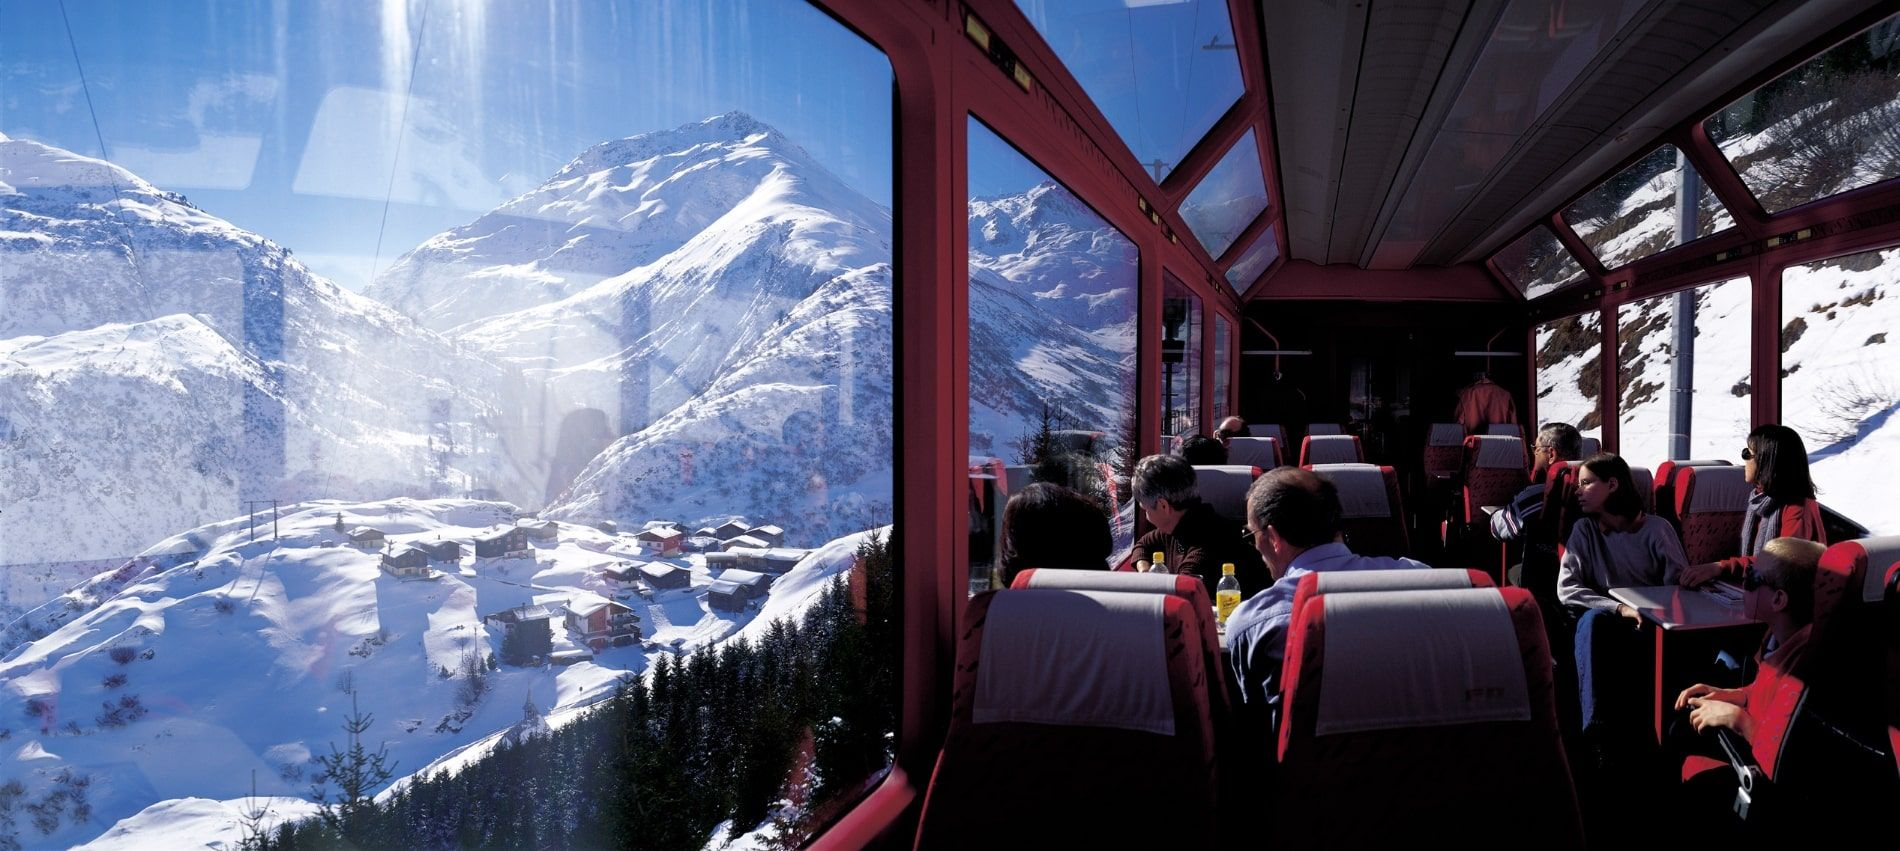 ⓒ Swiss Tourism|Christof Sonderegger